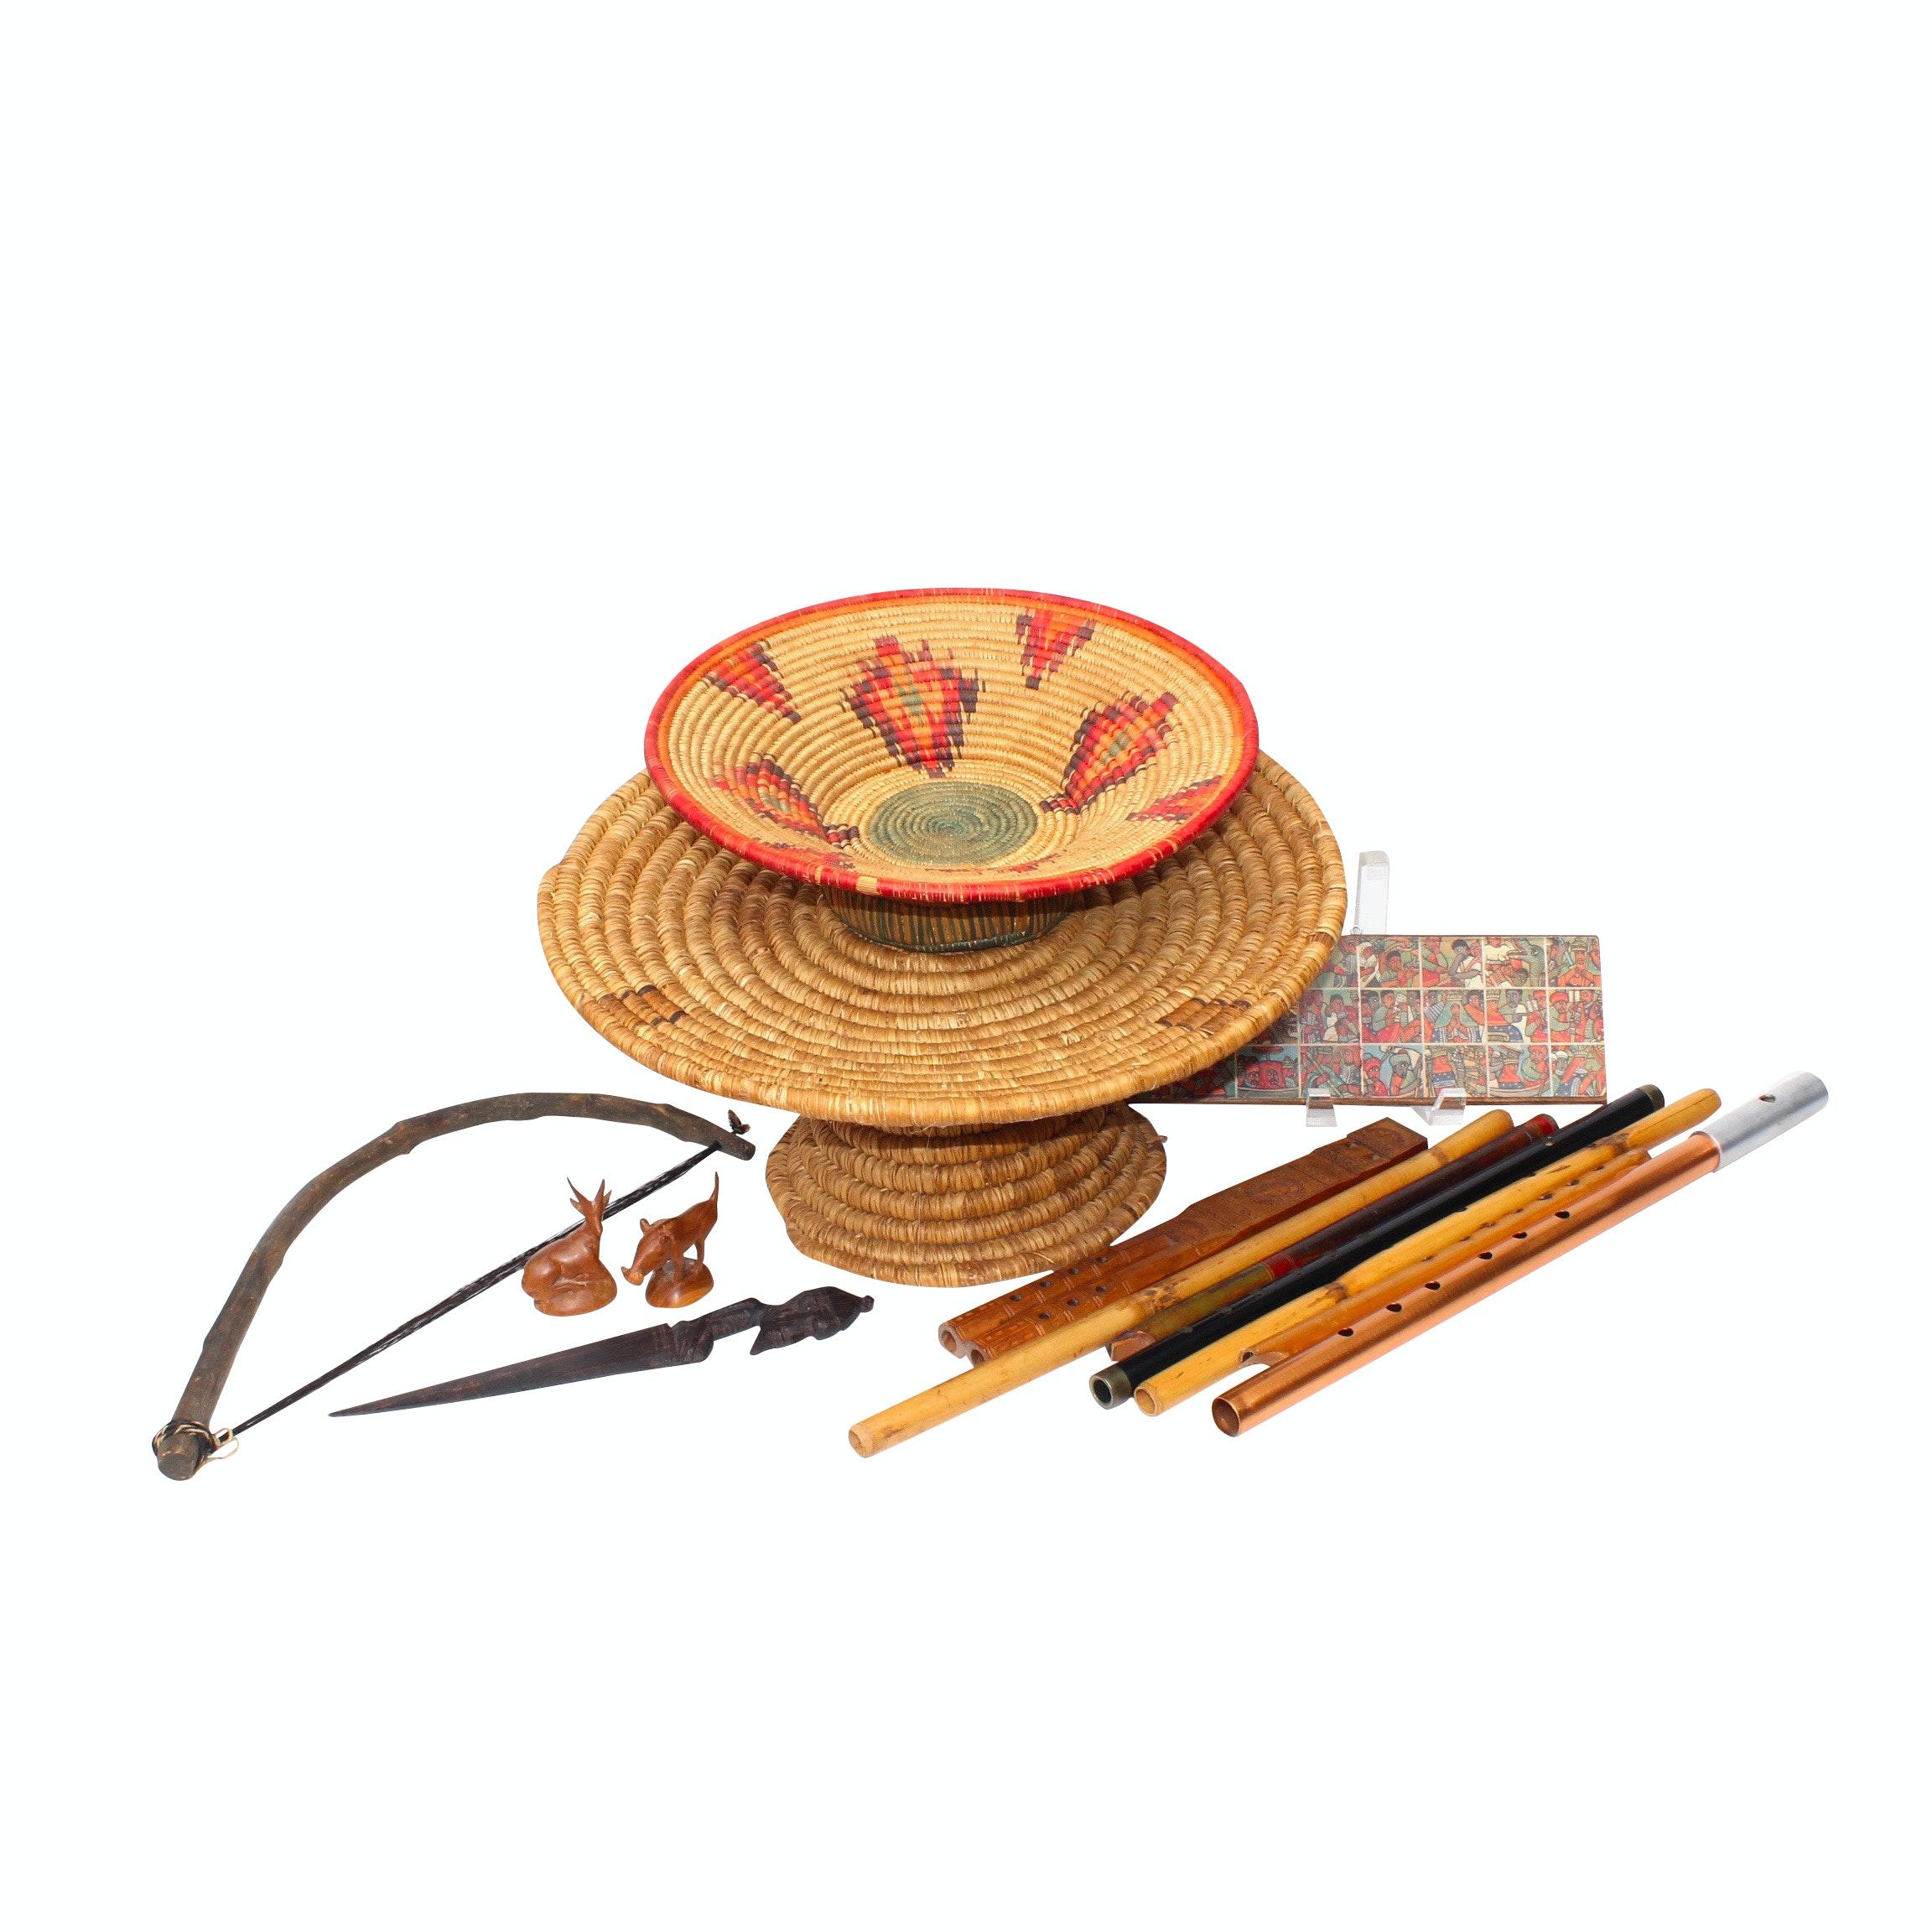 Ethiopian Flutes and Other Artisan Decor